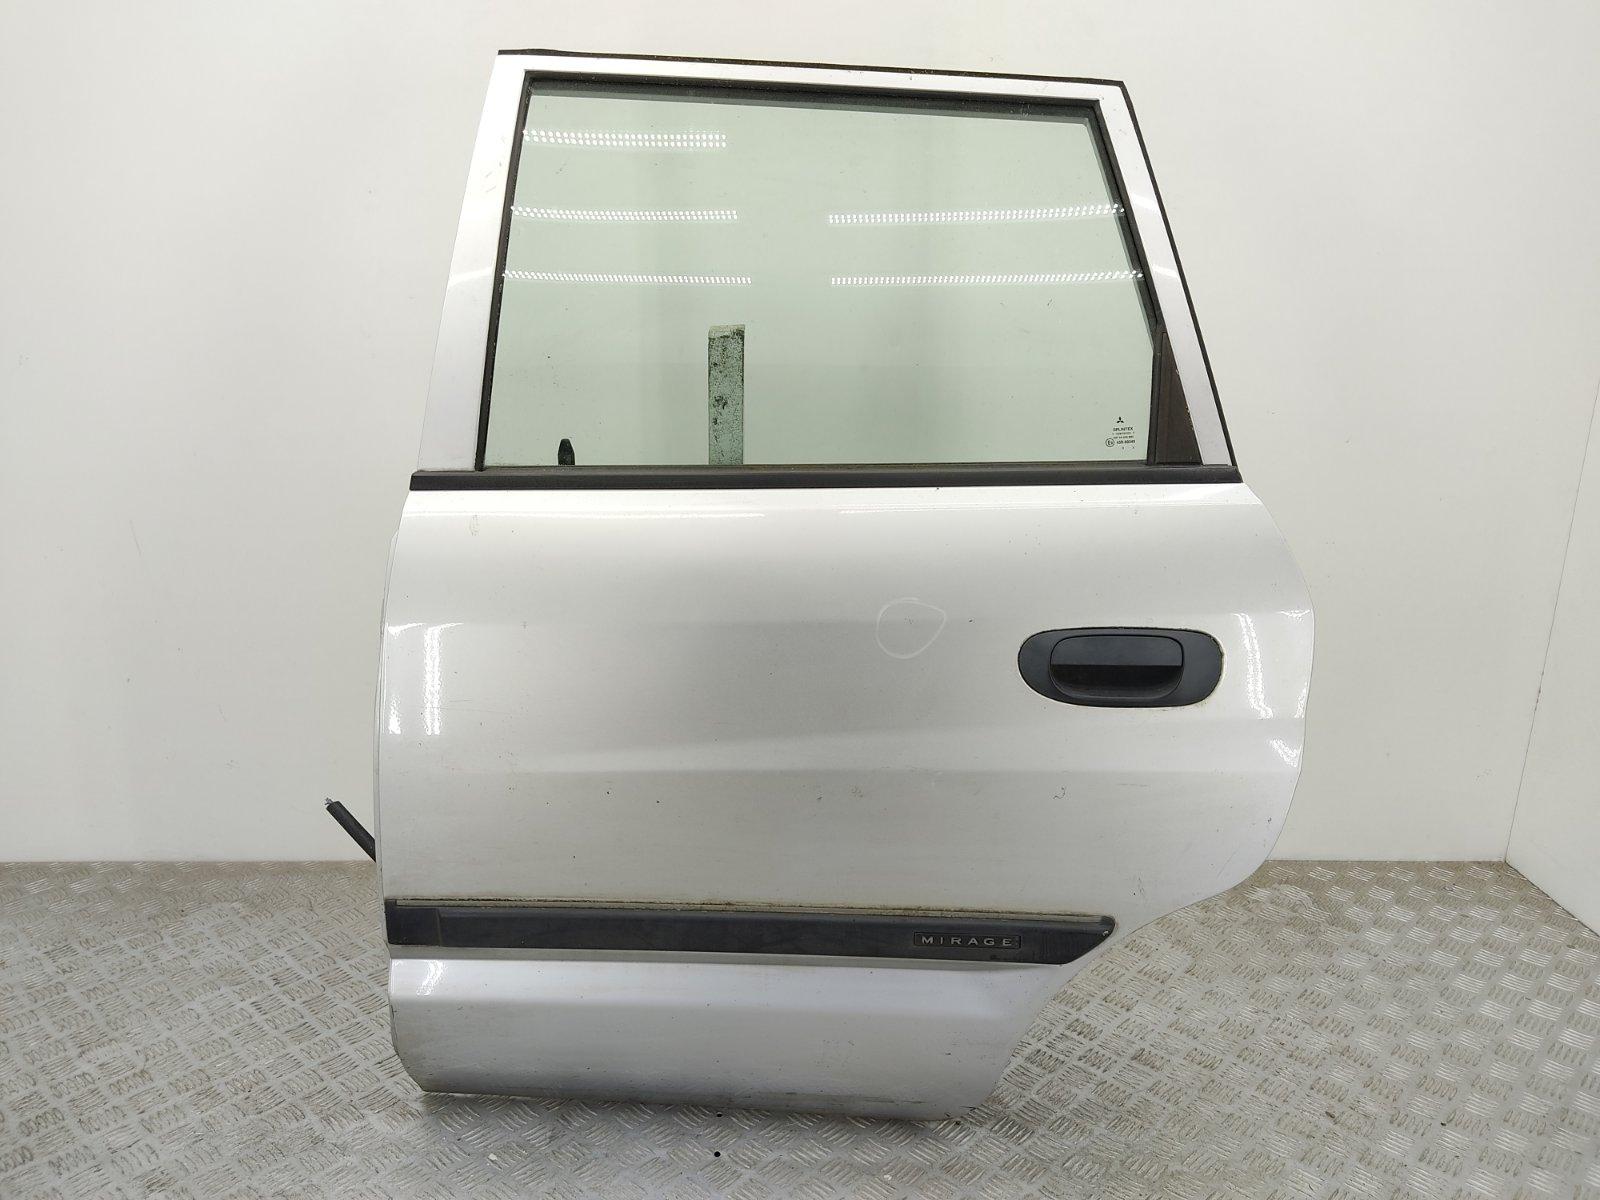 Дверь задняя левая Mitsubishi Space Star 1.9 DID 2002 (б/у)